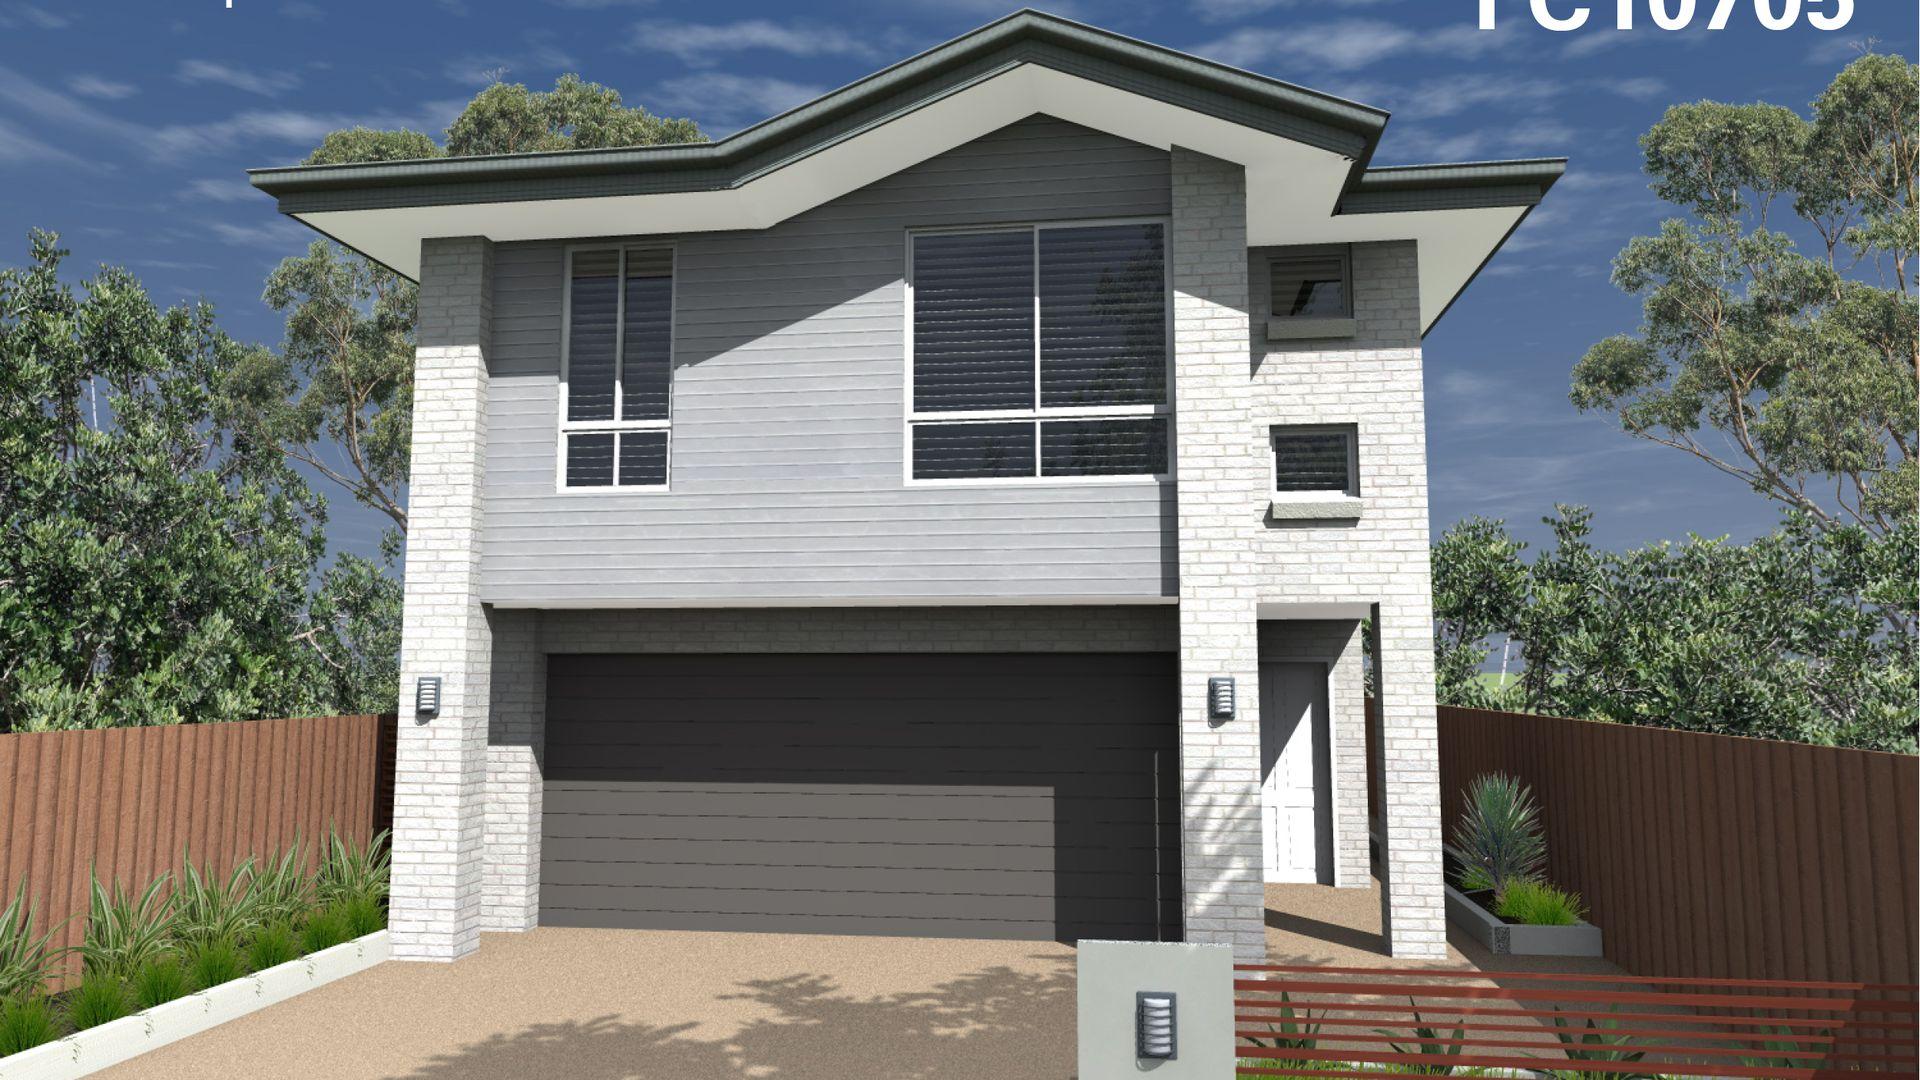 Lot 120 Weedbrook Street, Solander Estate, Park Ridge QLD 4125, Image 2